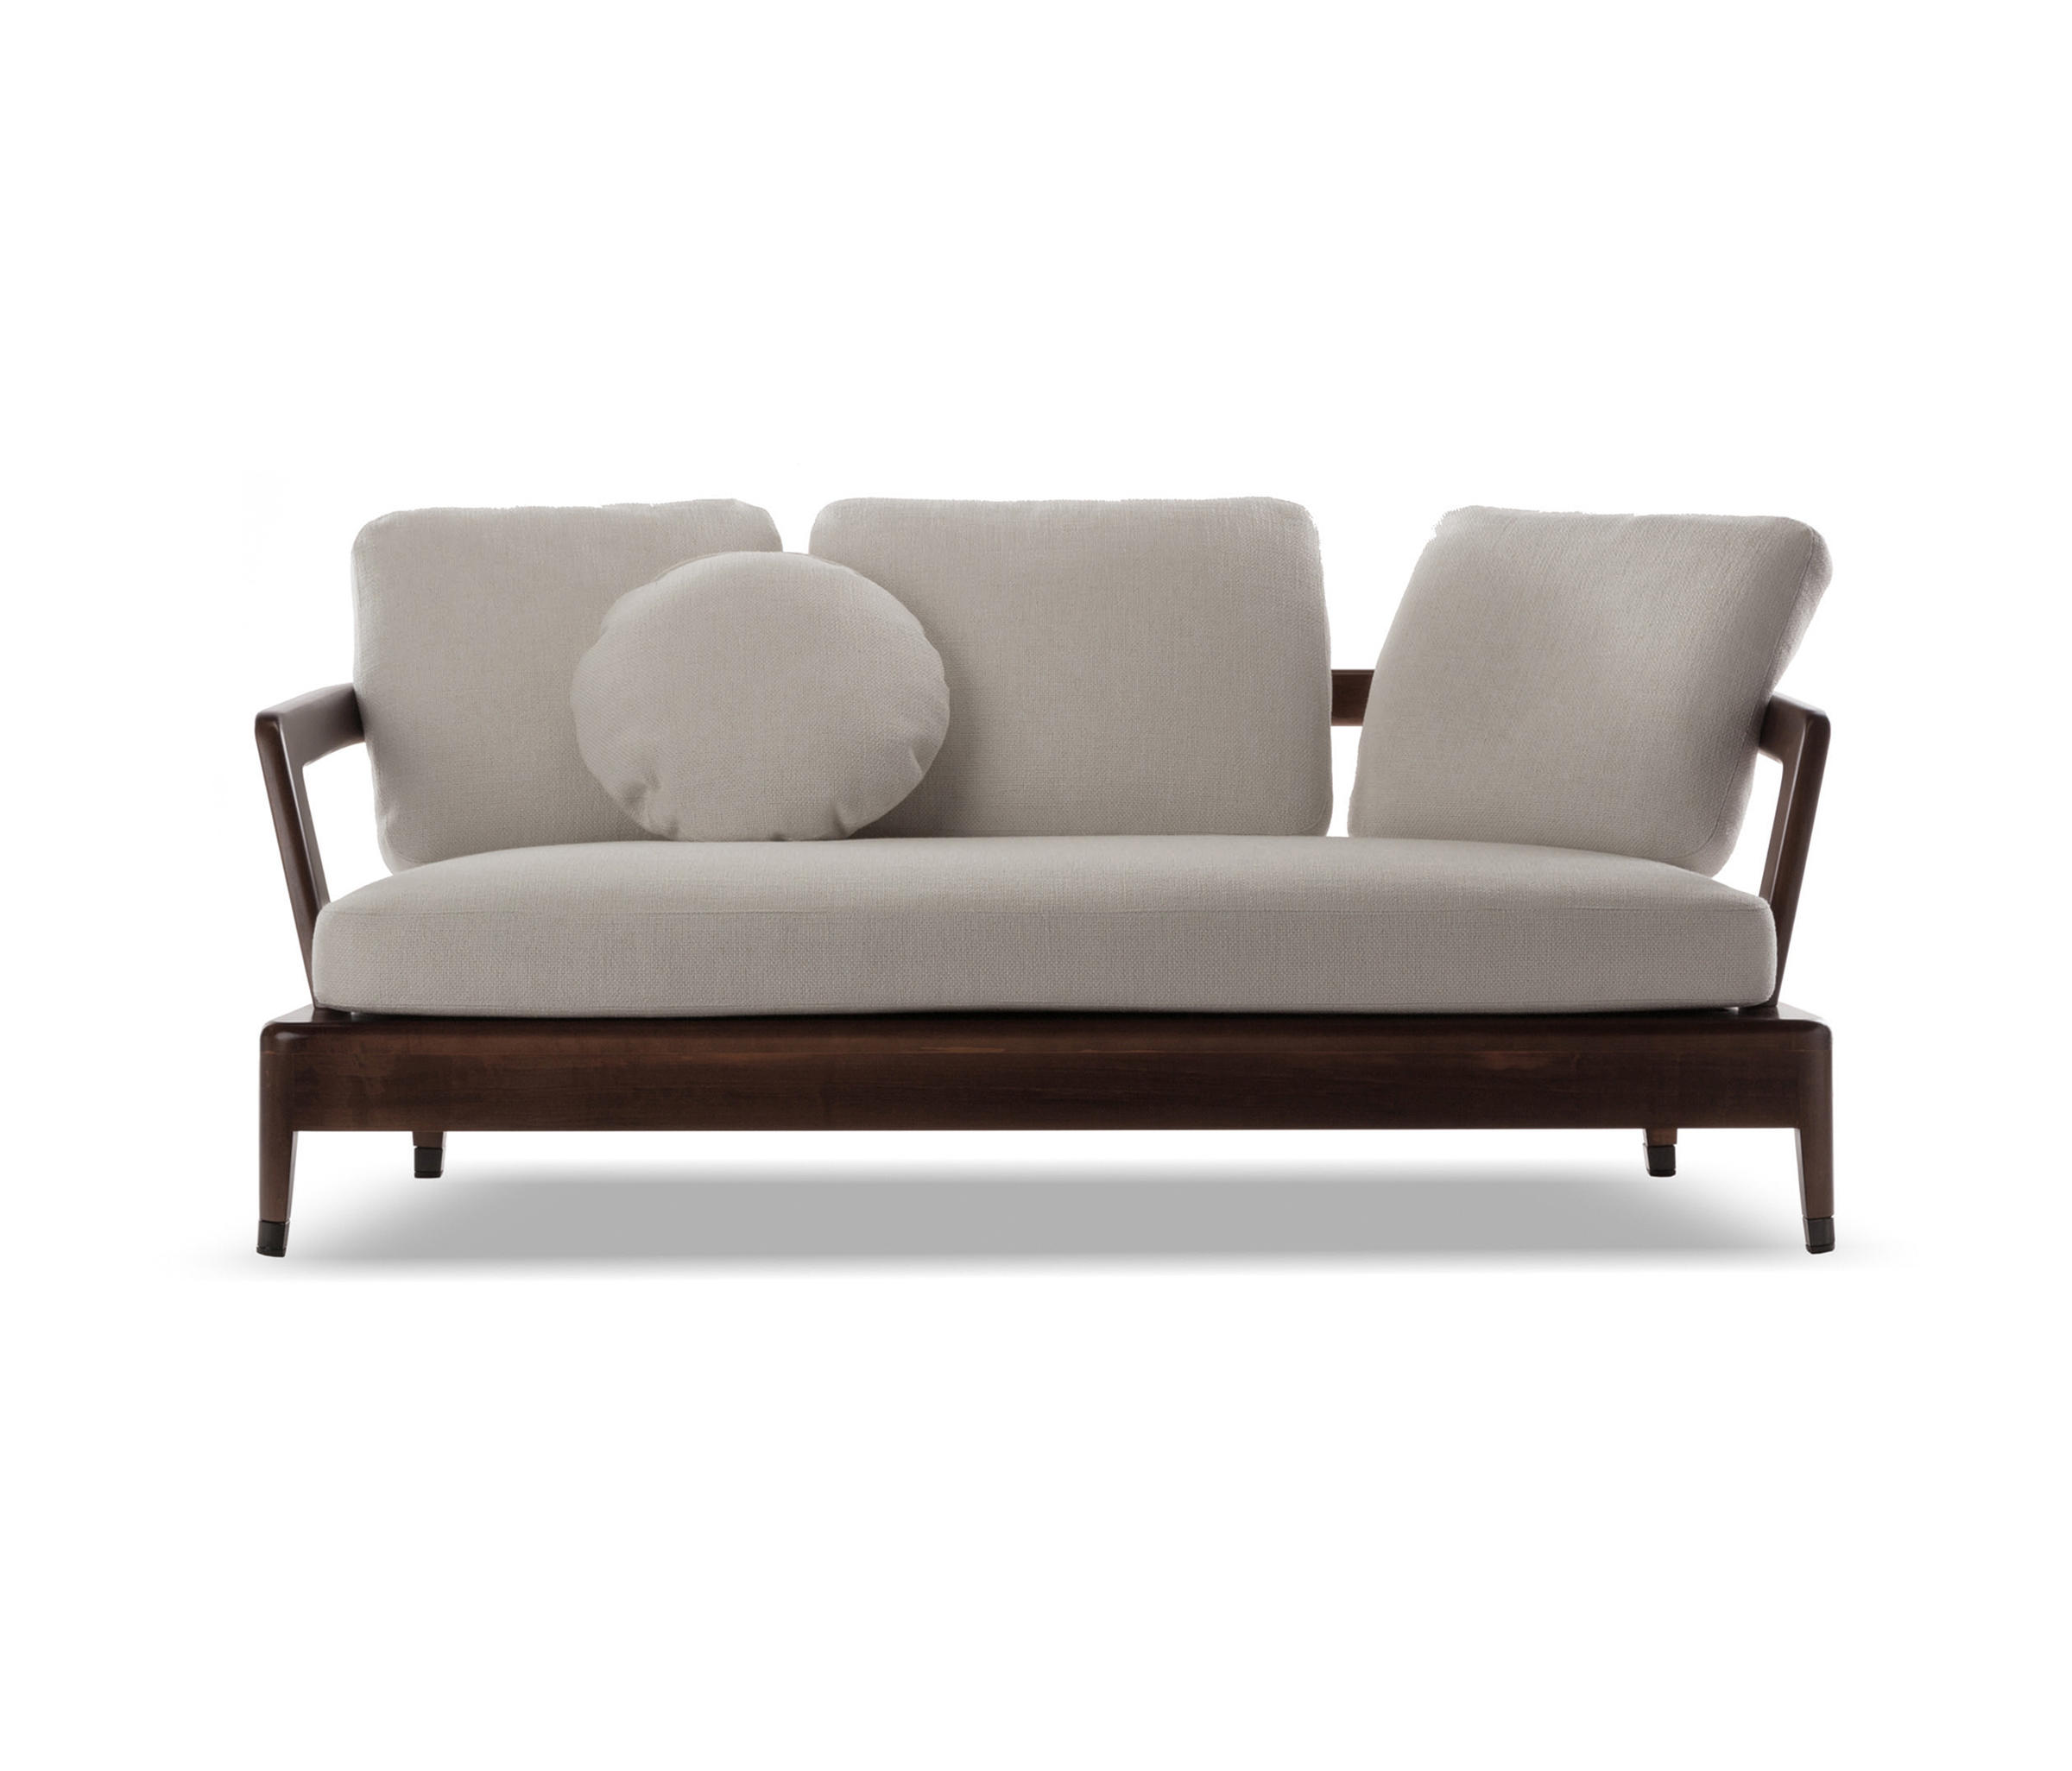 leather sofa washington dc vintage cover virginia j m furniture